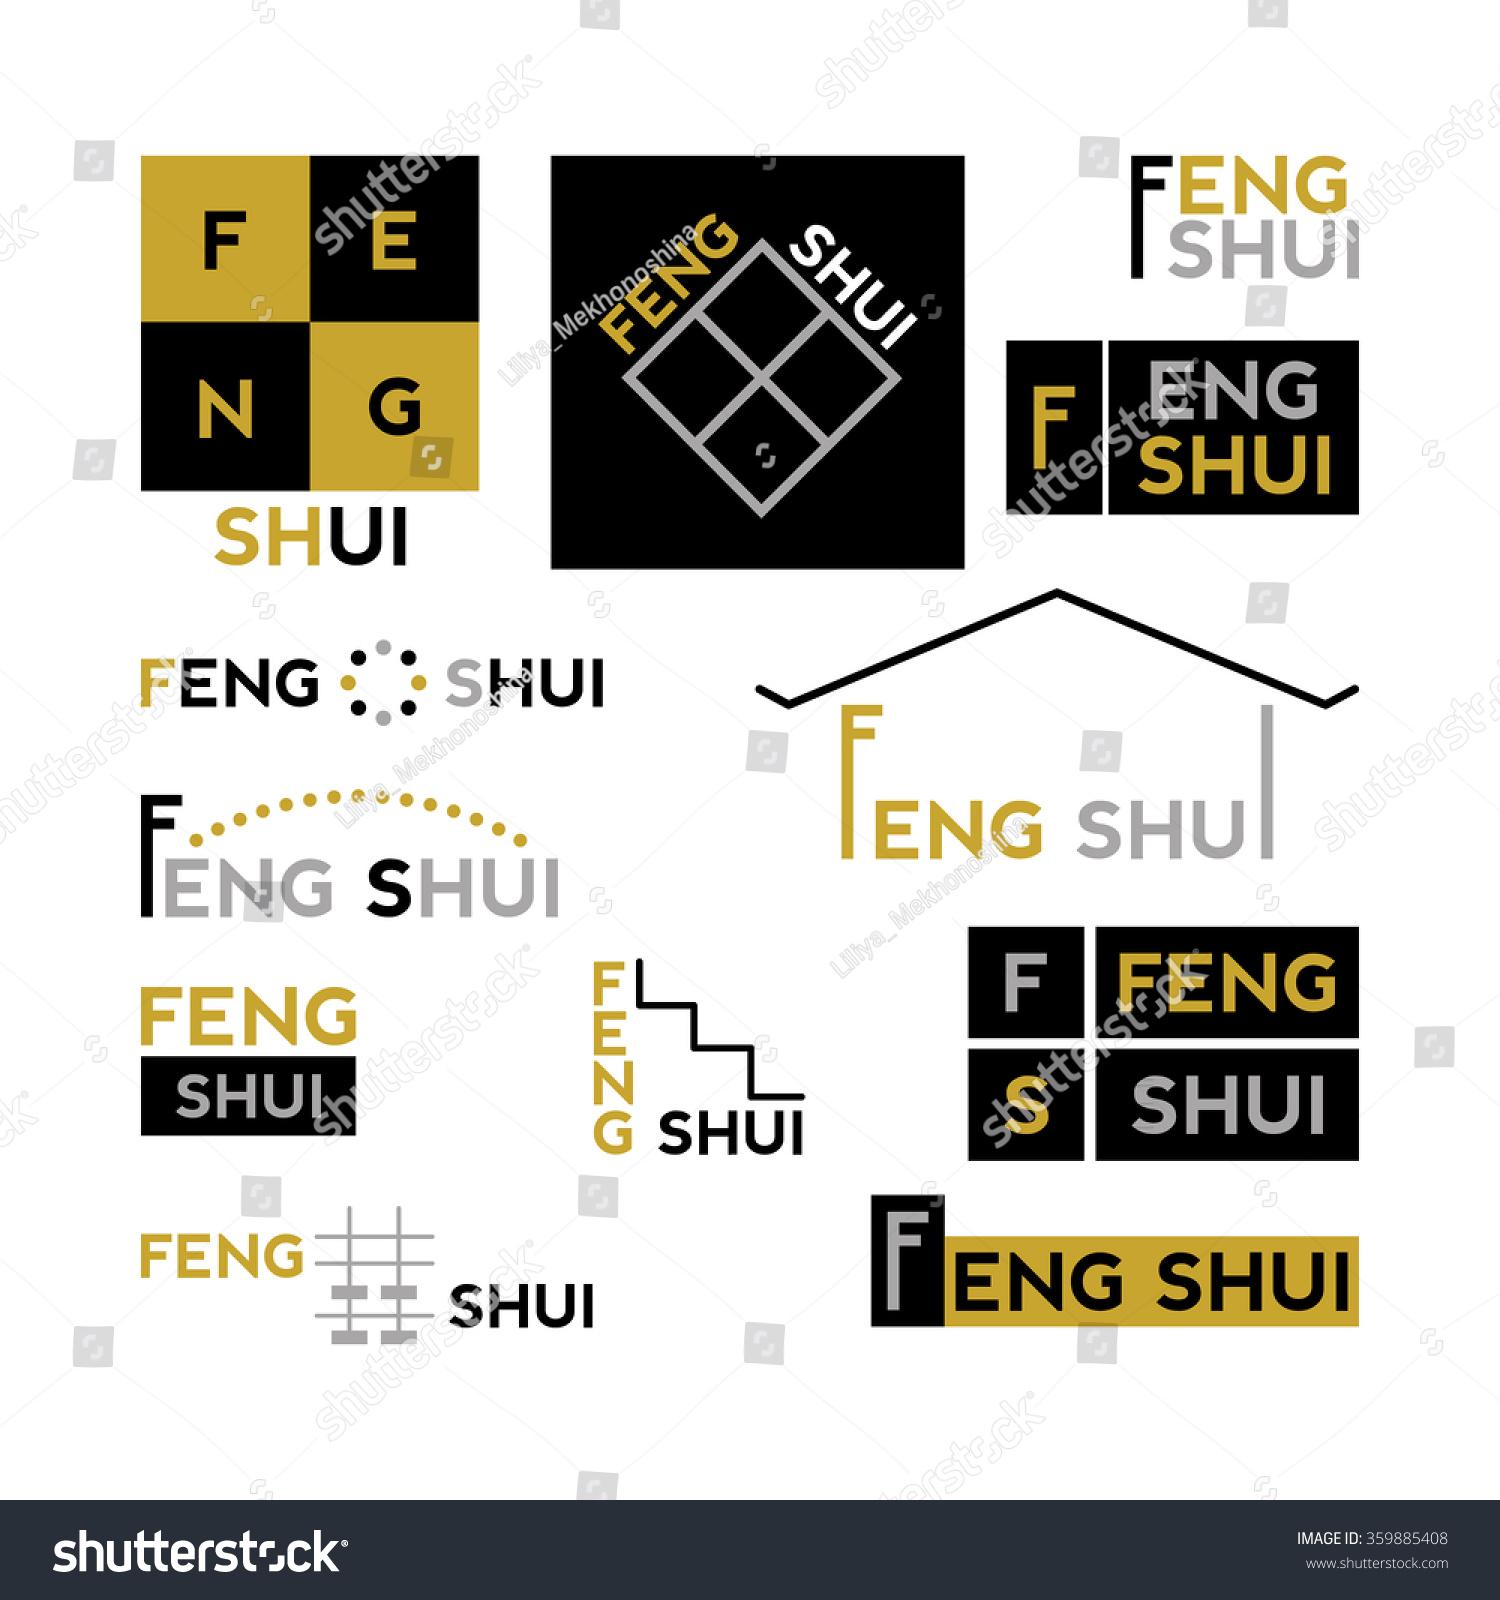 Photo Salon Feng Shui feng shui collection abstract logos set stock image